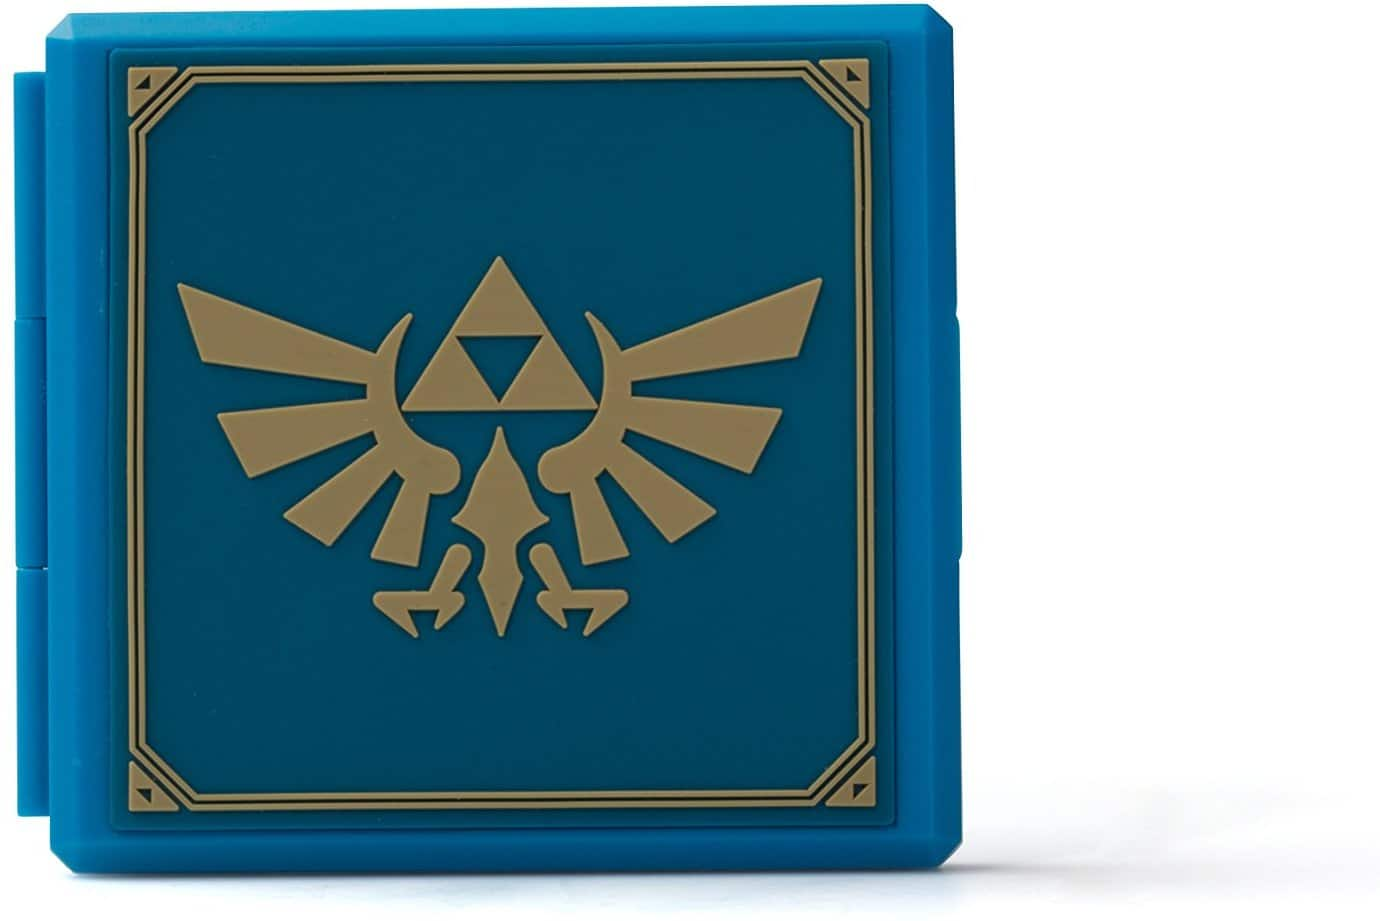 Amazon Nintendo Switch Zelda Game Card Case - $5.97